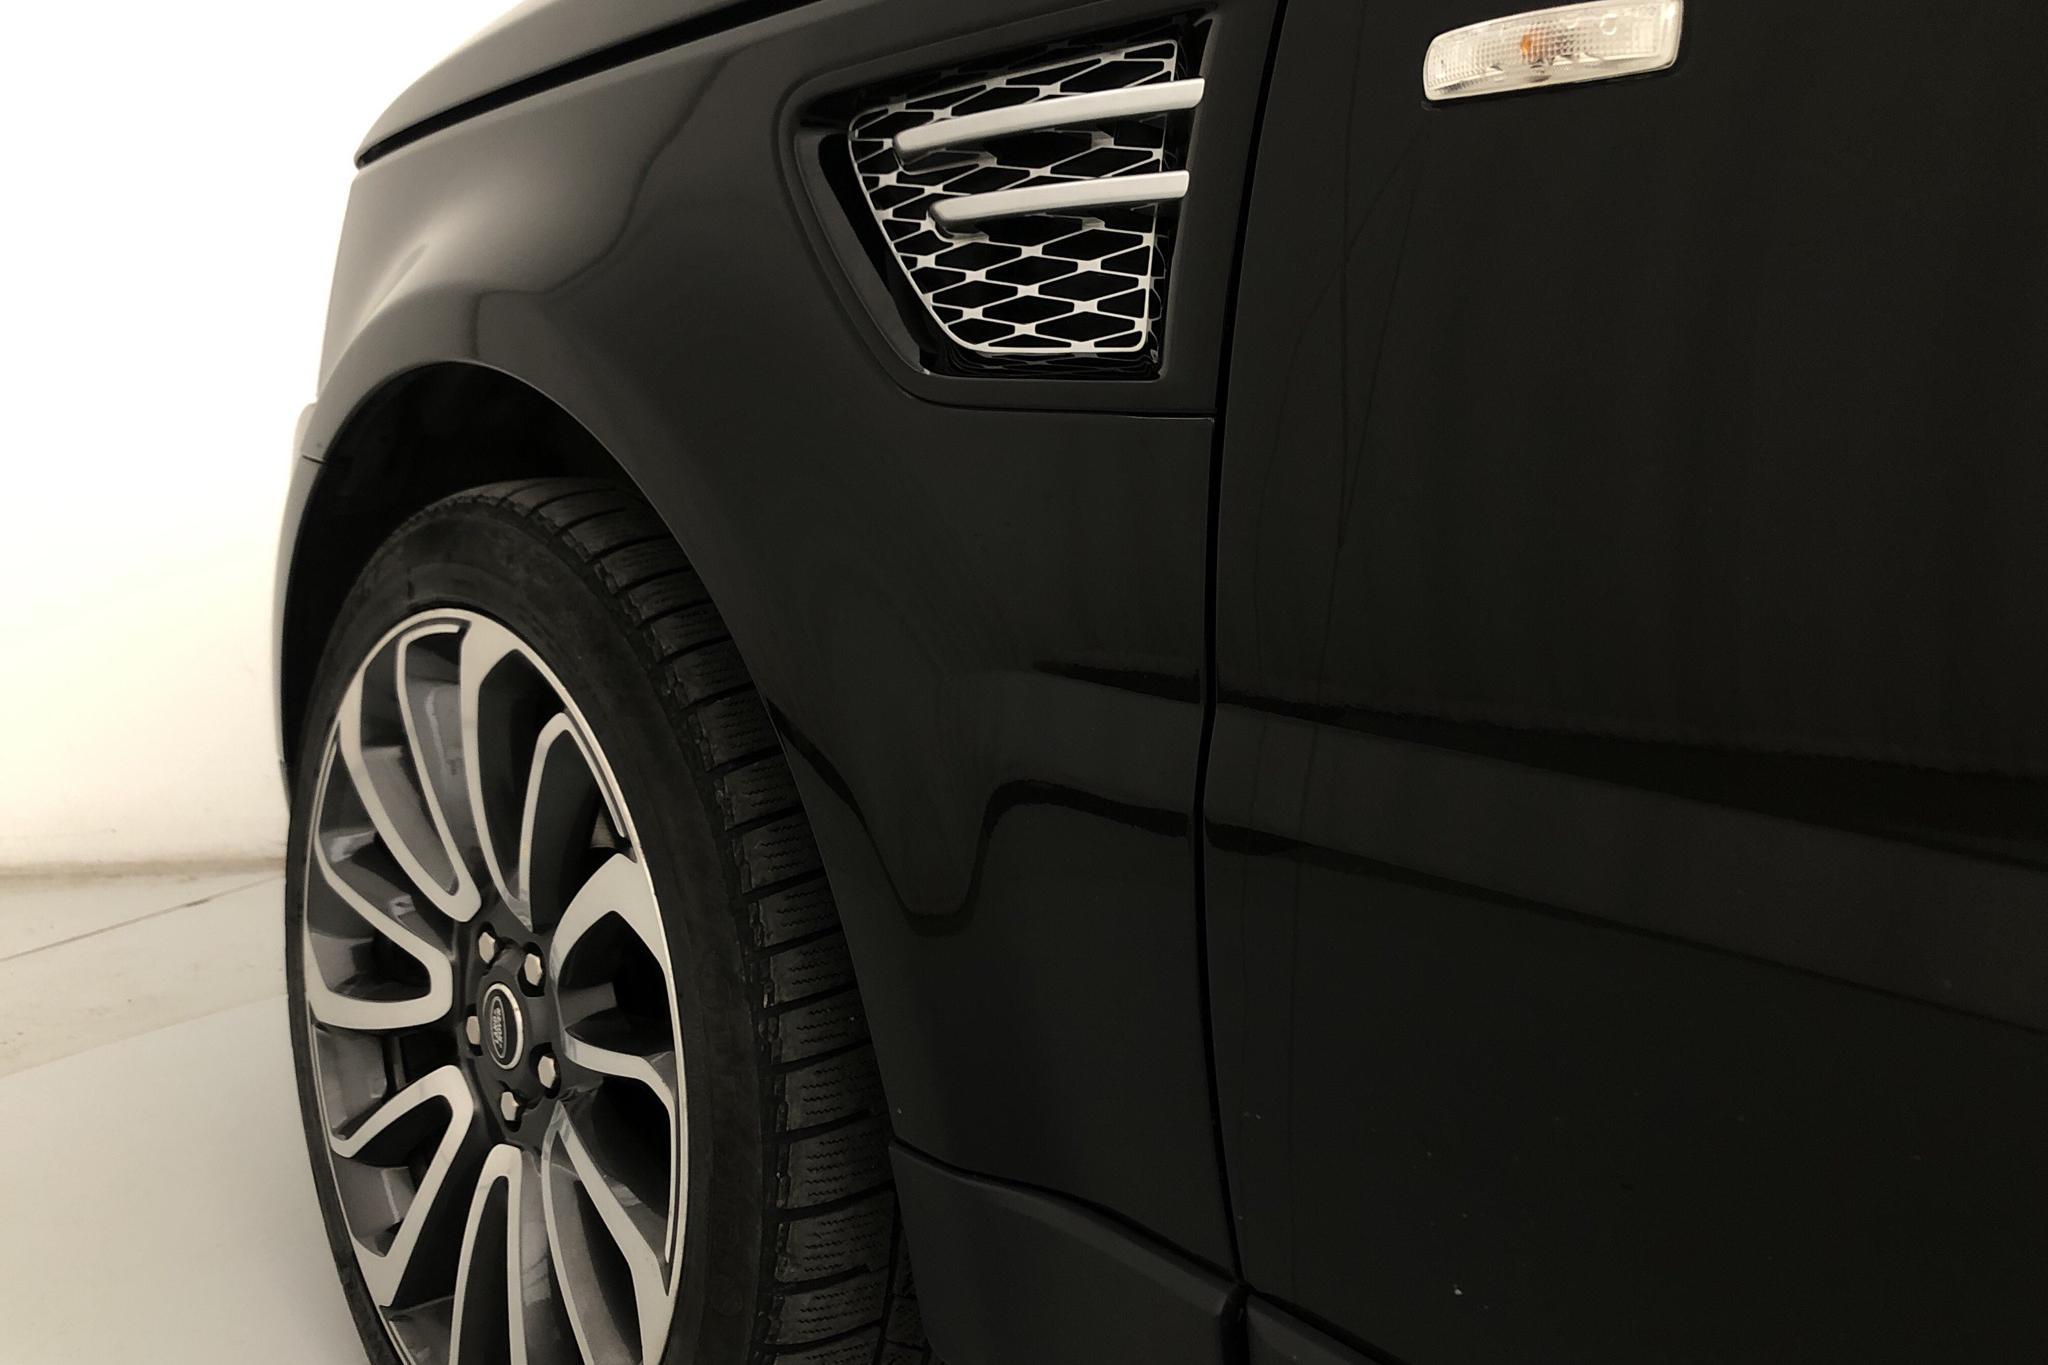 Land Rover Range Rover Sport SDV6 3.0 (255hk) - 140 300 km - Automatic - black - 2013